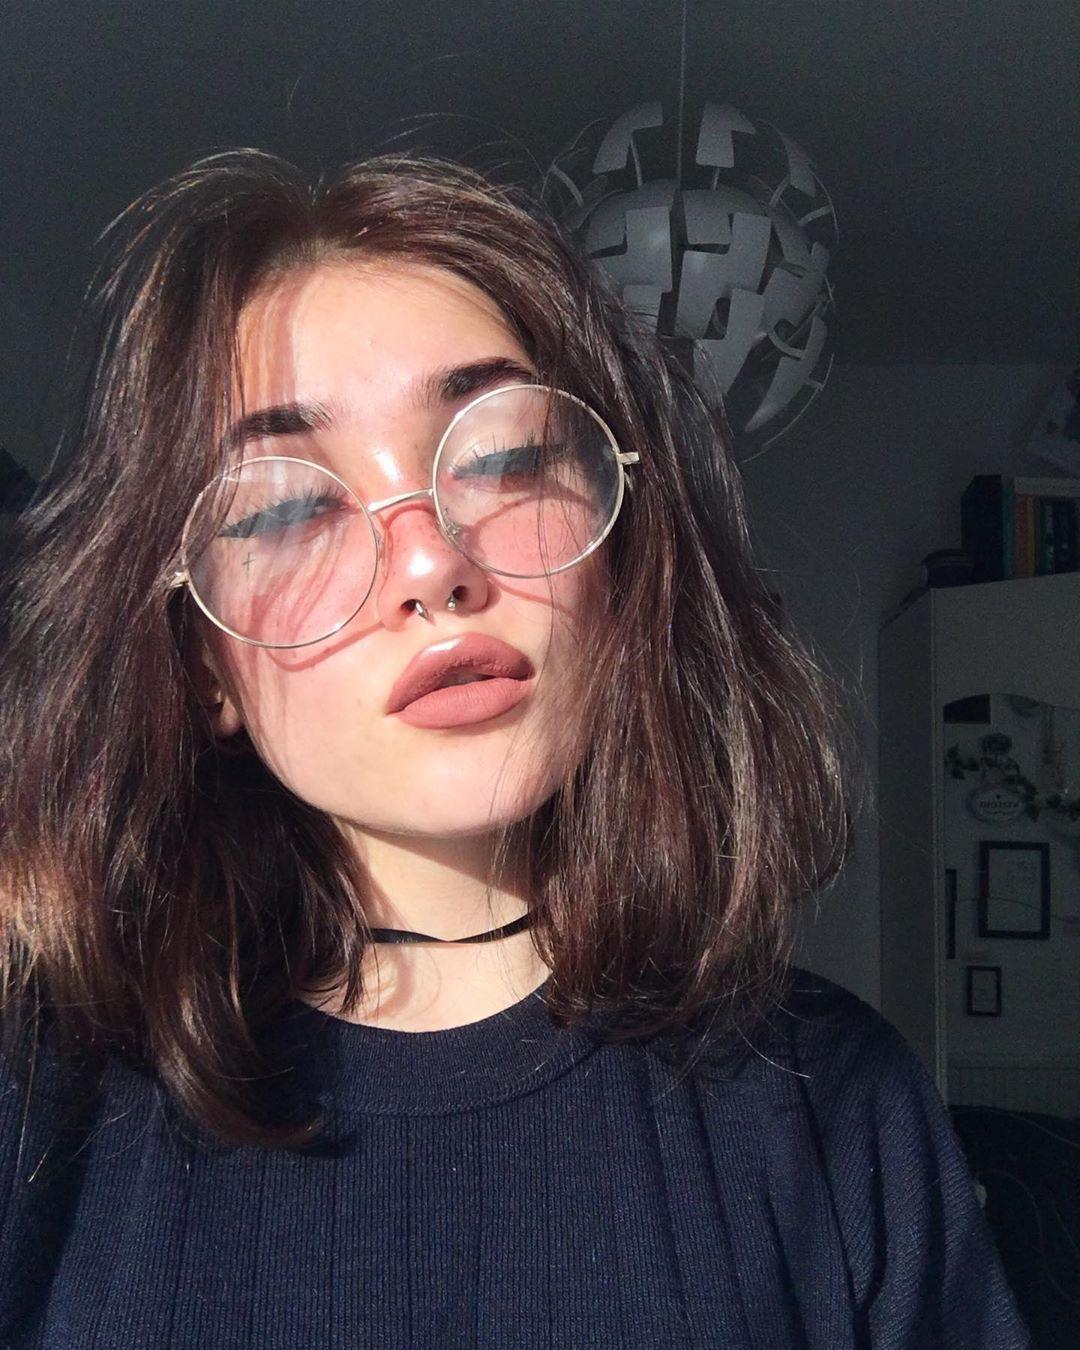 Kasia On Instagram Let S Get Some Love Mood Joke Cats Are My Life Egirl Grunge Grunger Soft Grunge Hair Aesthetic Hair Edgy Makeup